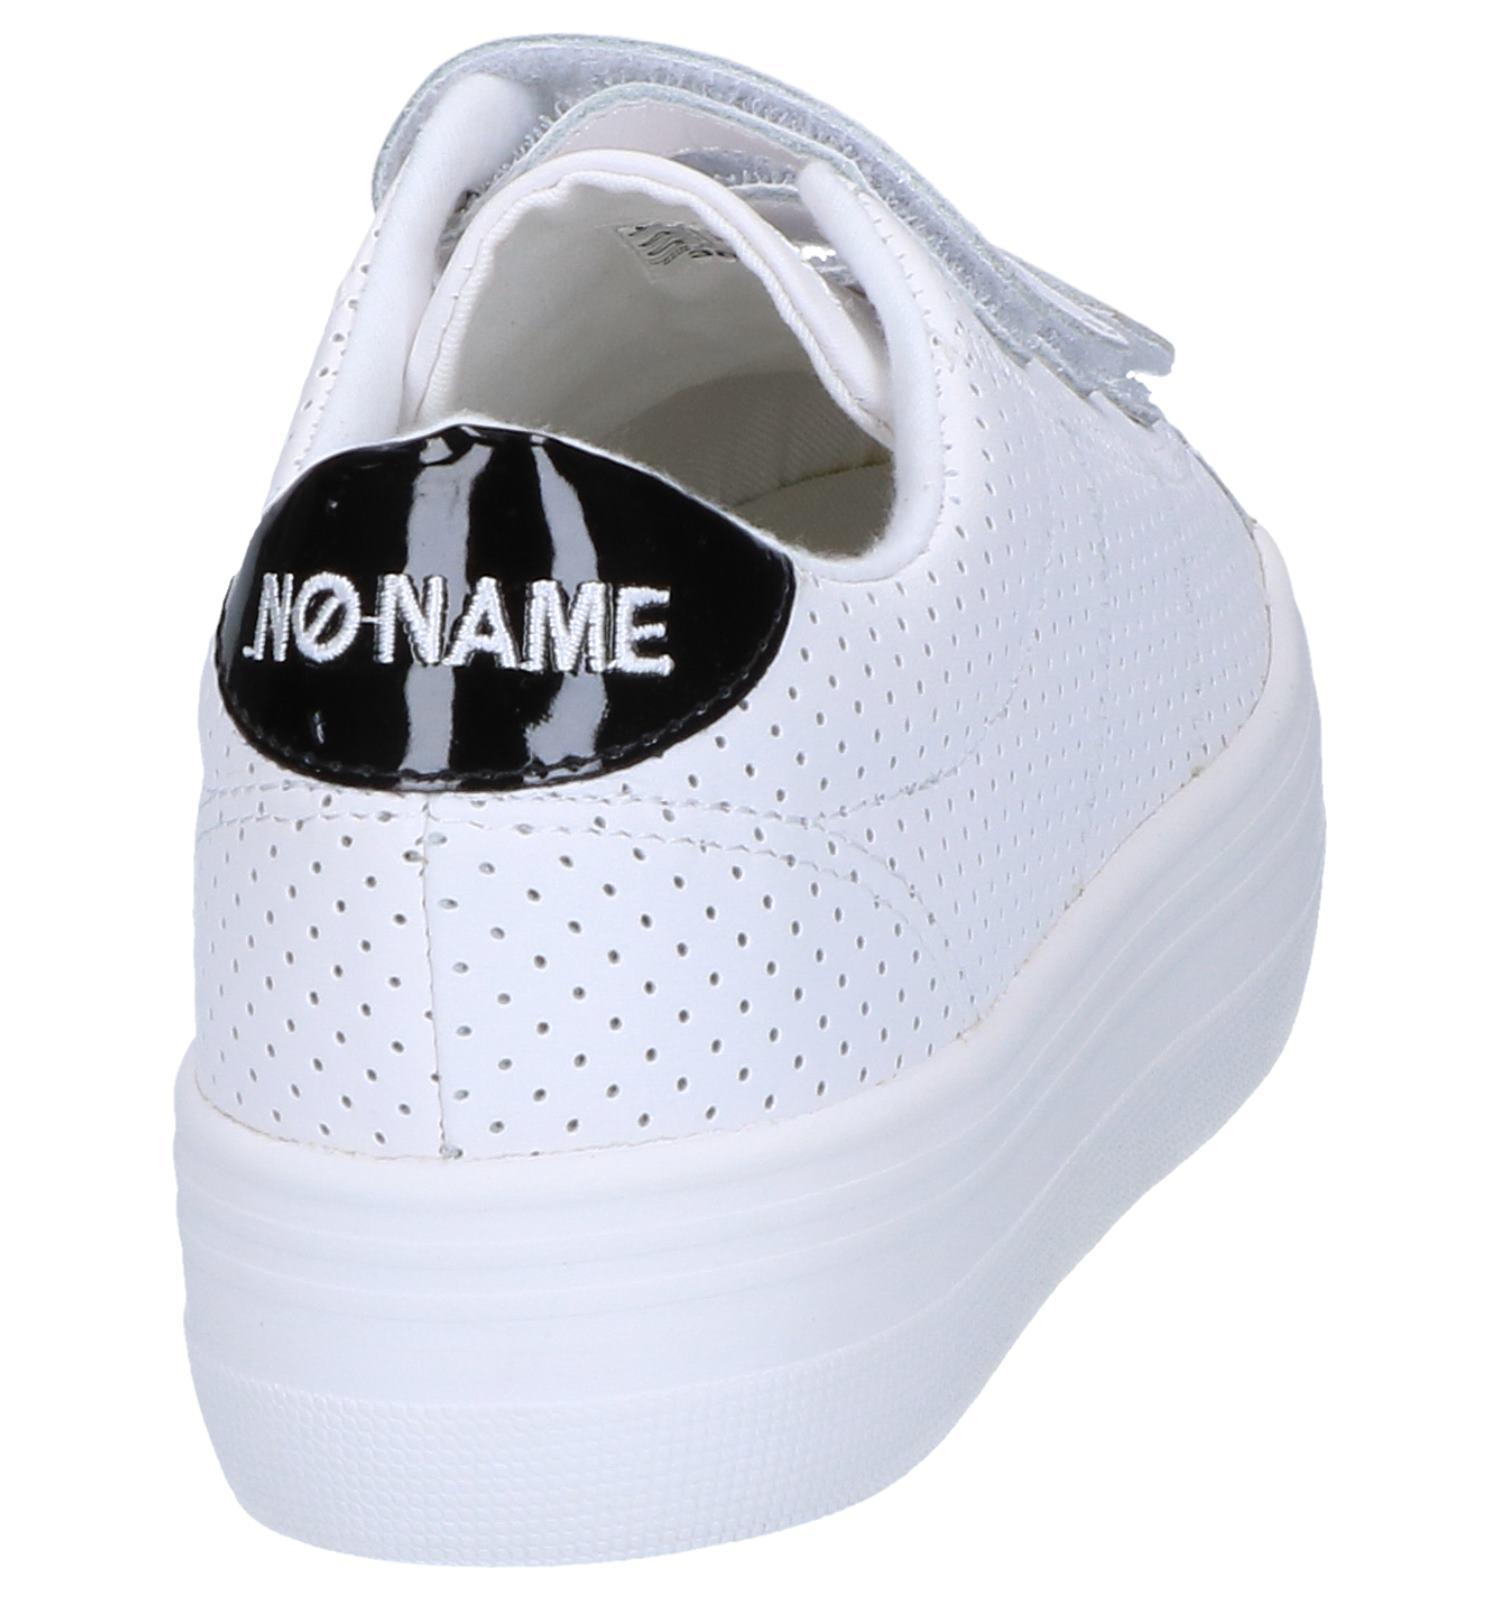 No Plato Straps Name Sneakers Witte ZPkiXOu